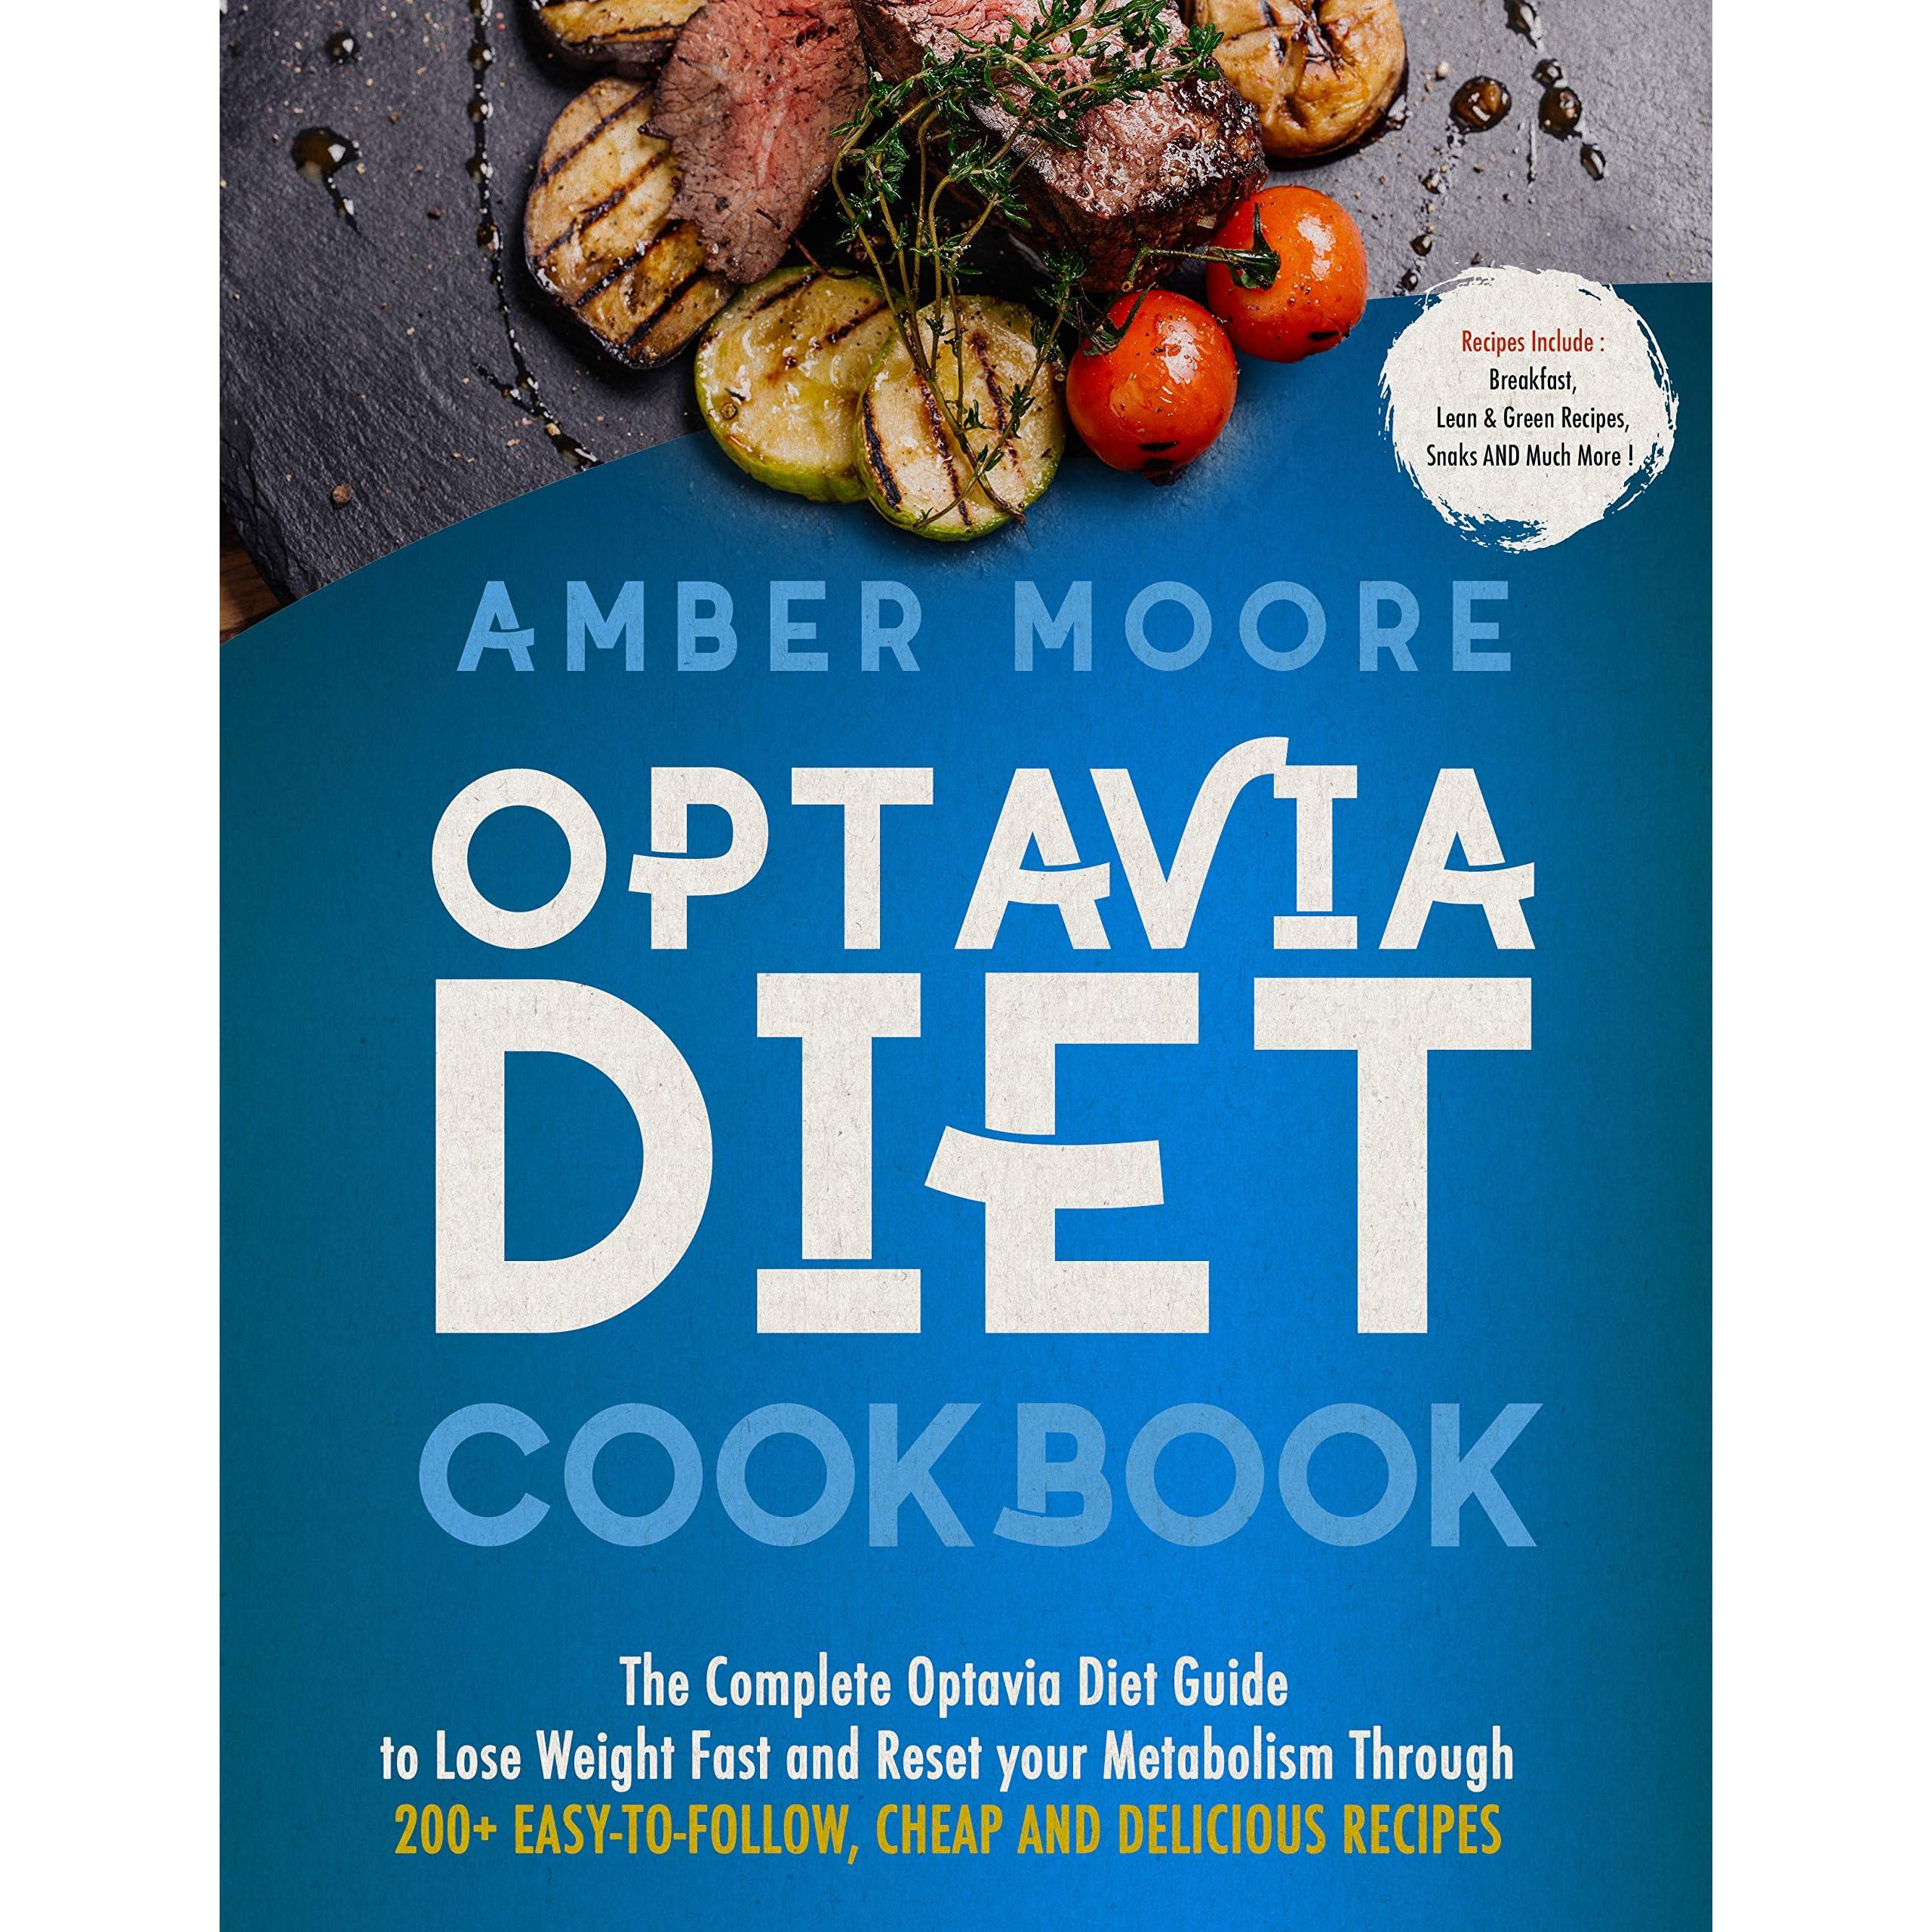 Optavia Diet Cookbook: The Complete Optavia Diet Guide to Lose